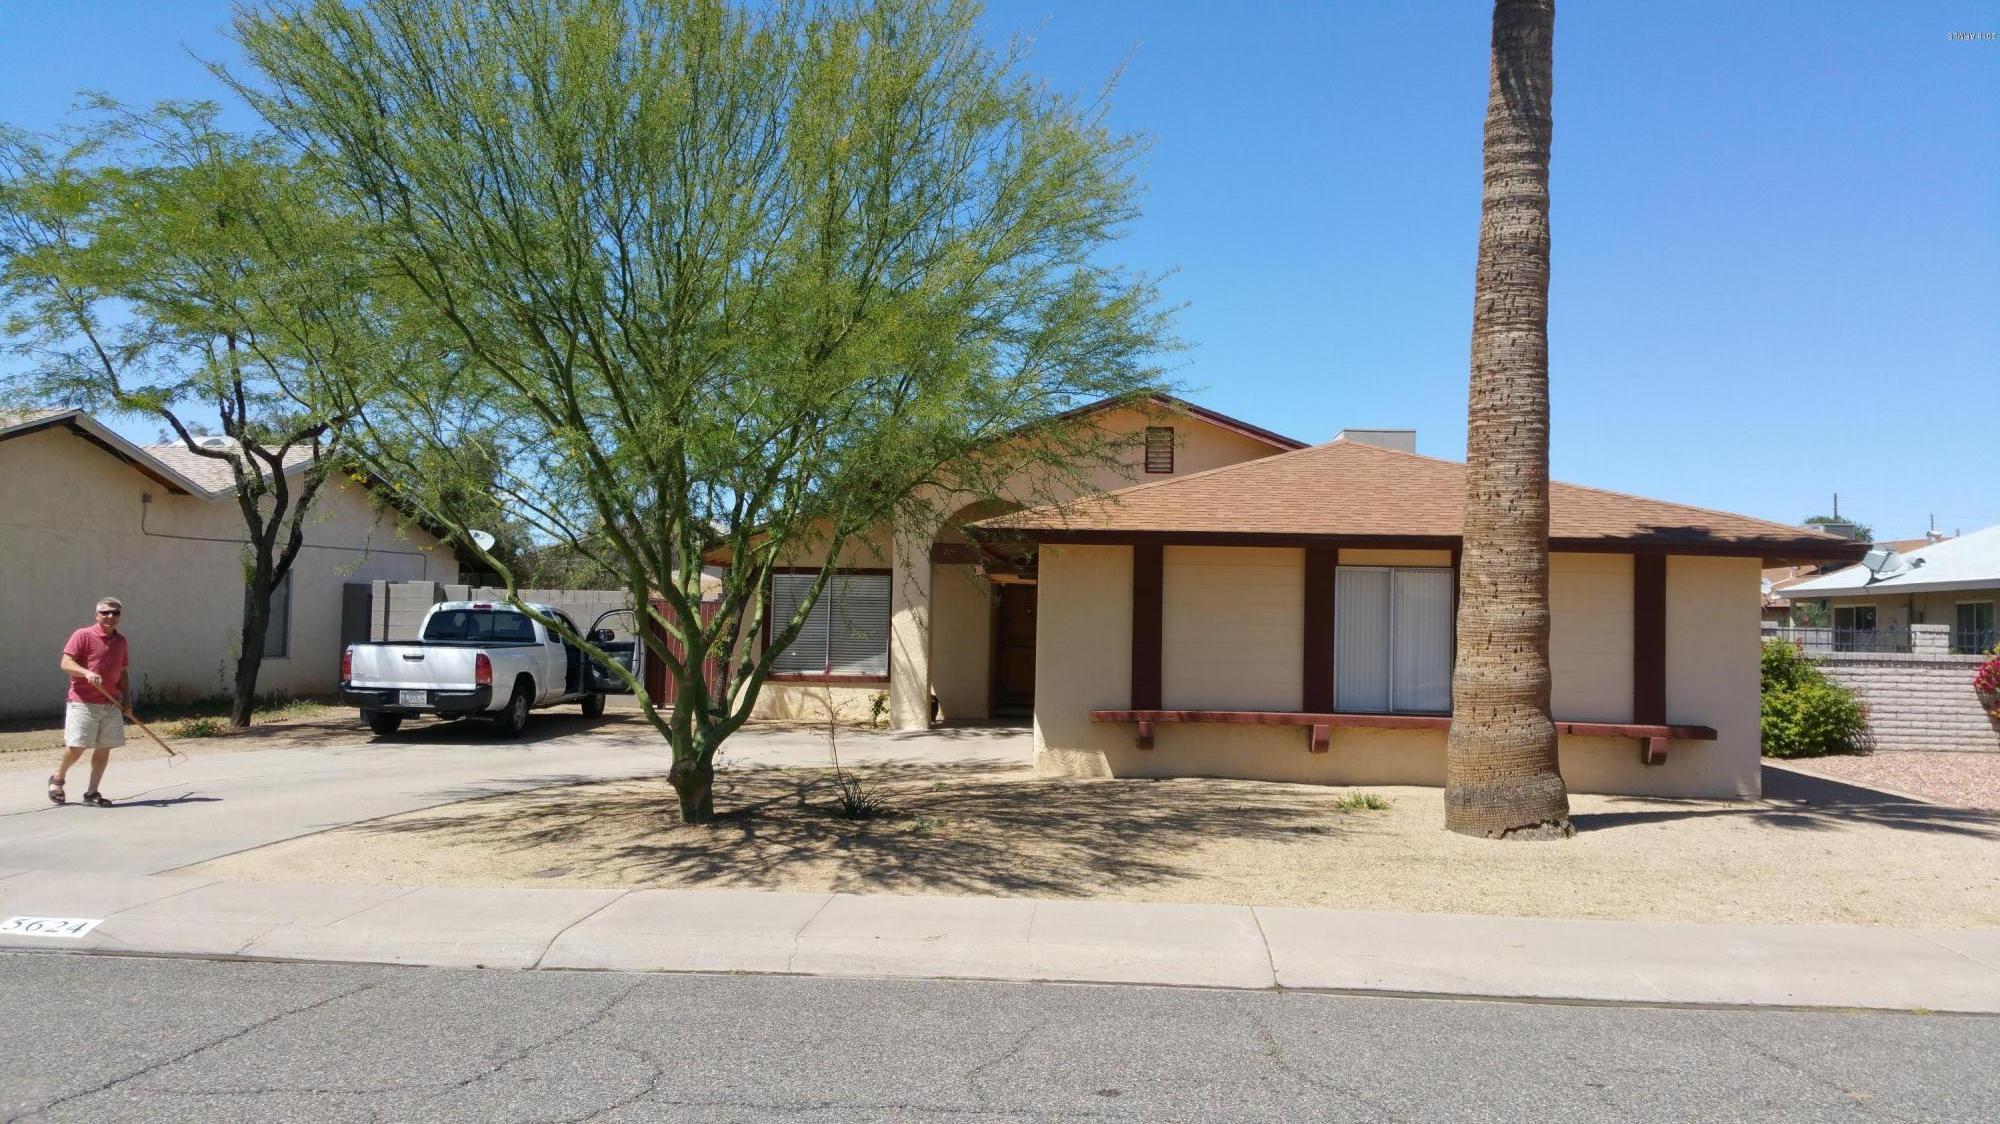 5624 W Townley  Avenue  Glendale AZ 85302